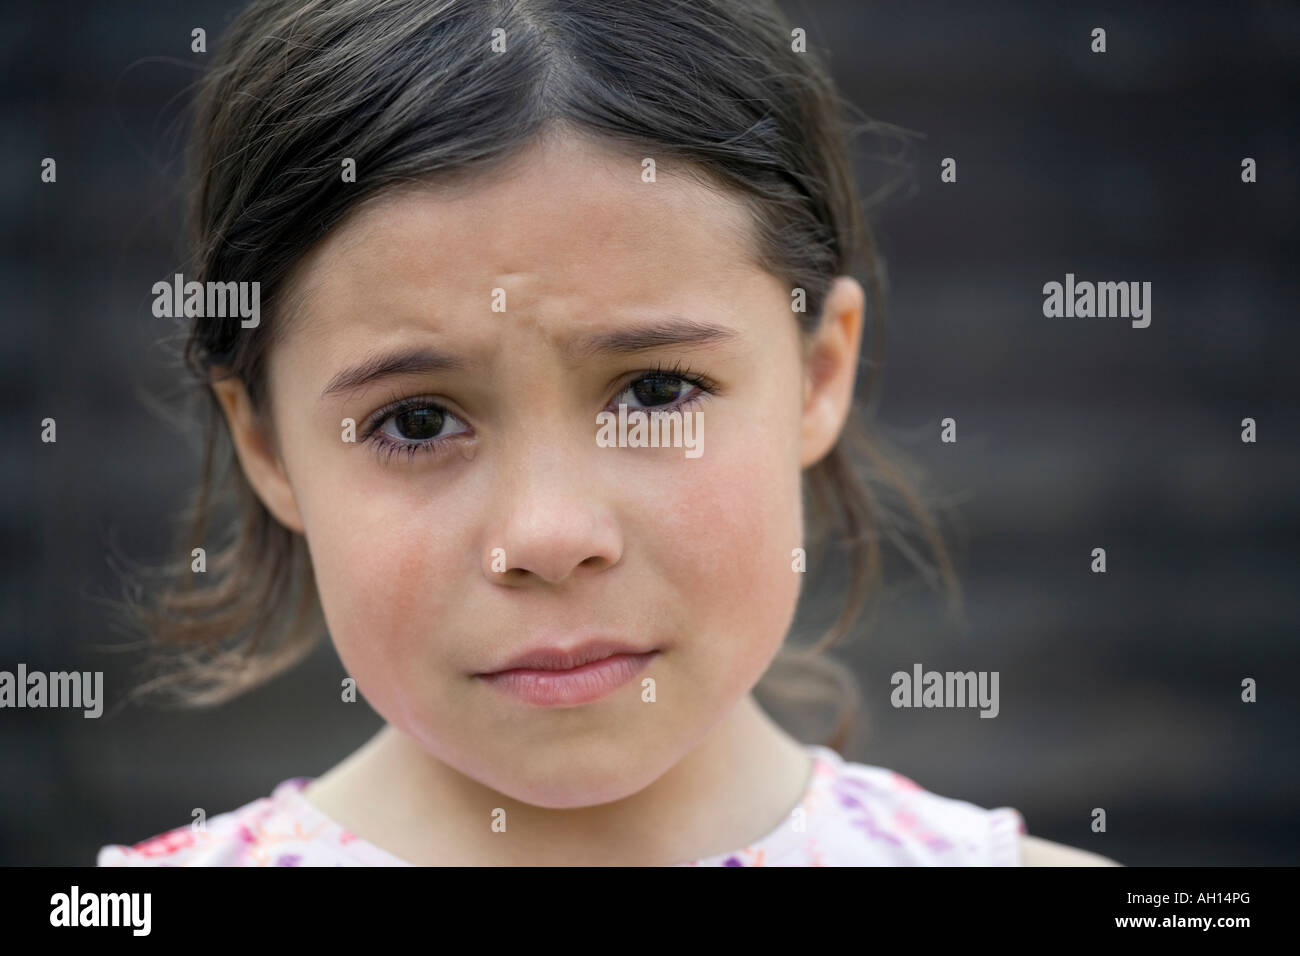 Girl Crying - Stock Image